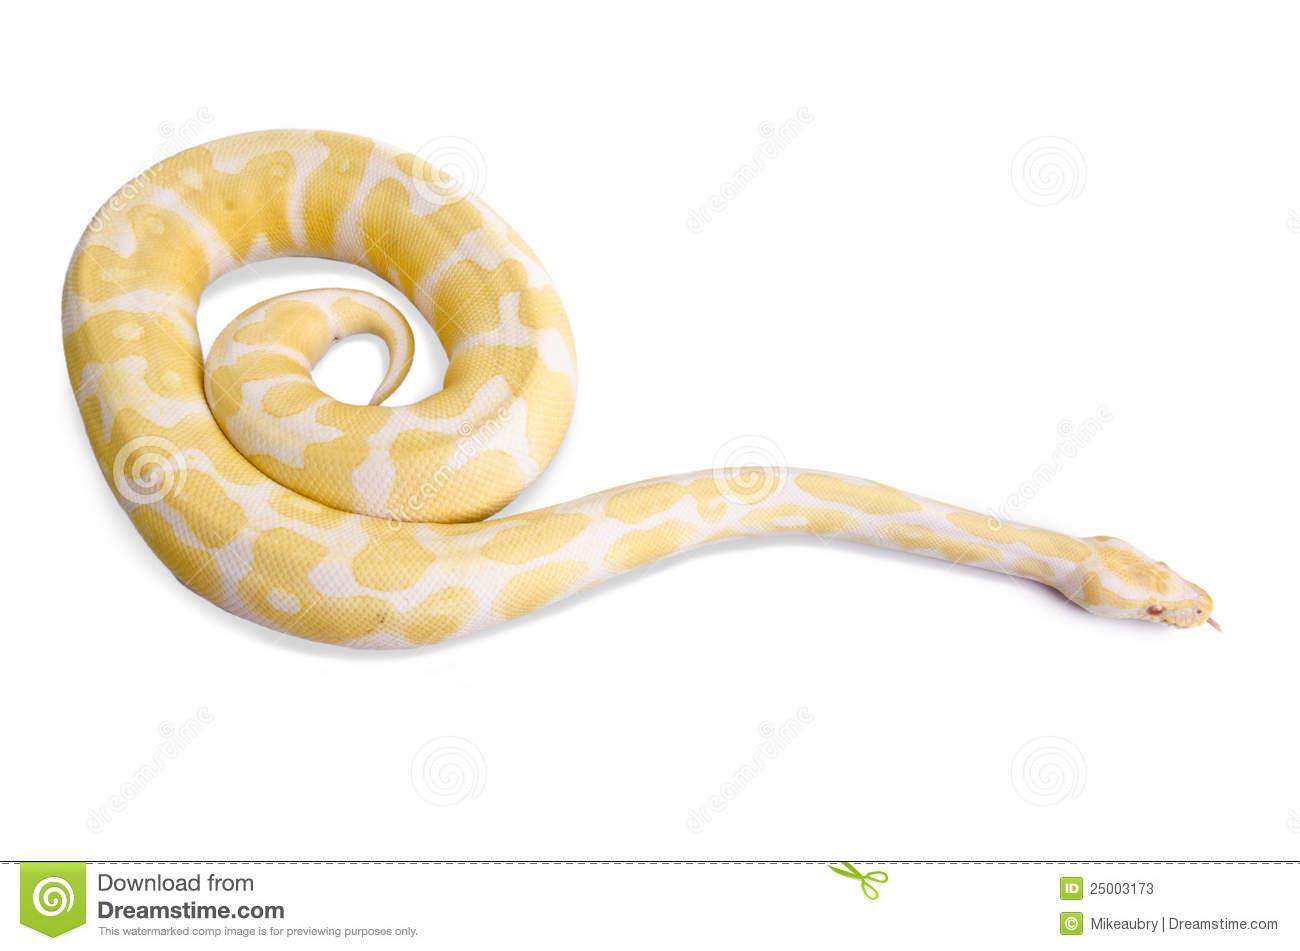 Burmese Python. Royalty Free Stock Image.